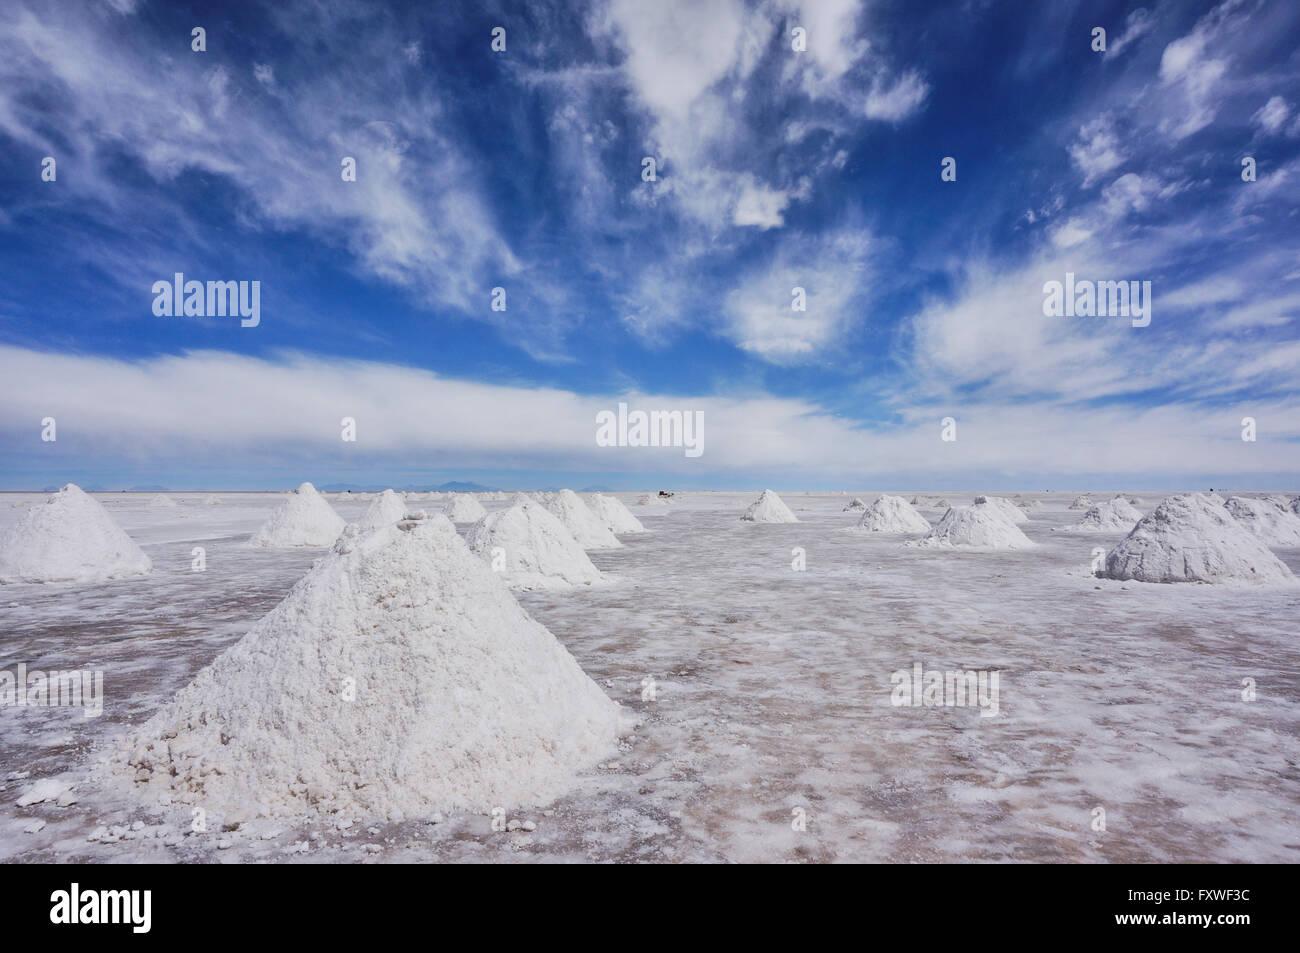 Bolivia -  22/08/2013  -  Bolivia / Salar de Uyuni / Uyuni  -  Salt desert, Uyuni   -  Sandrine Huet / Le Pictorium - Stock Image